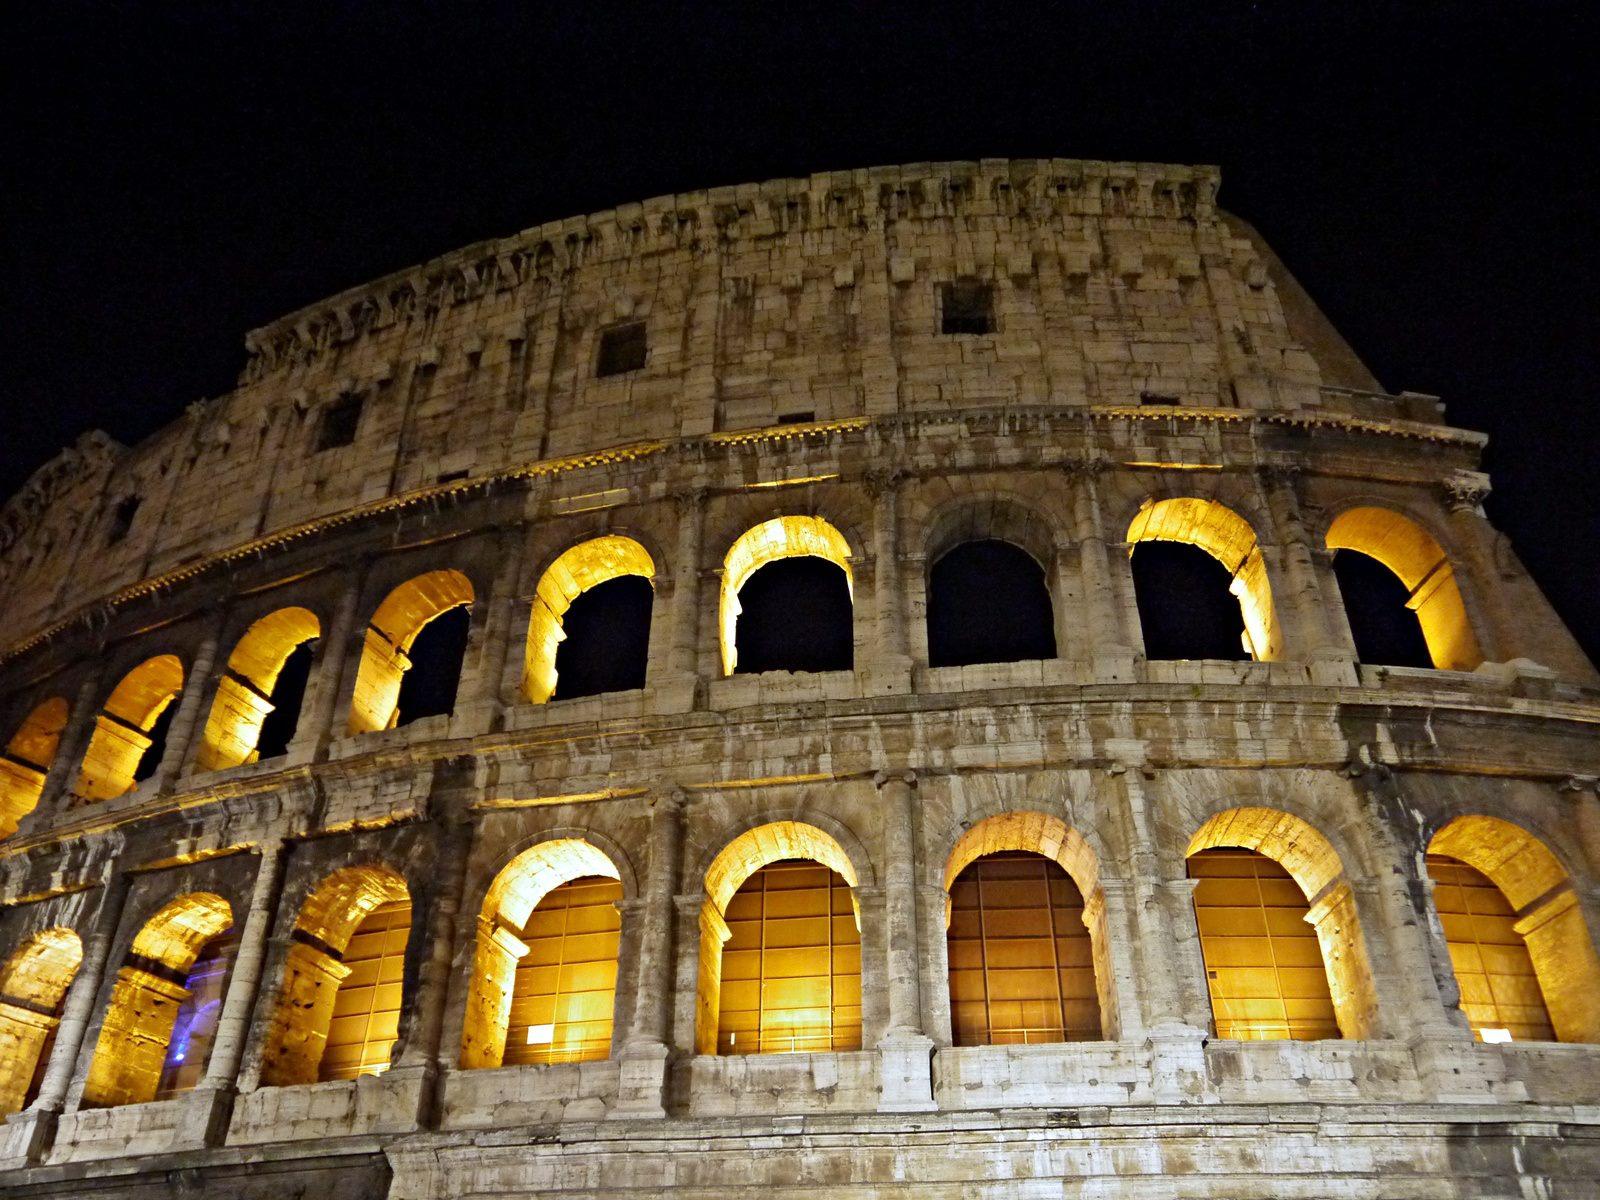 jermpins rome vatican city colosseum night